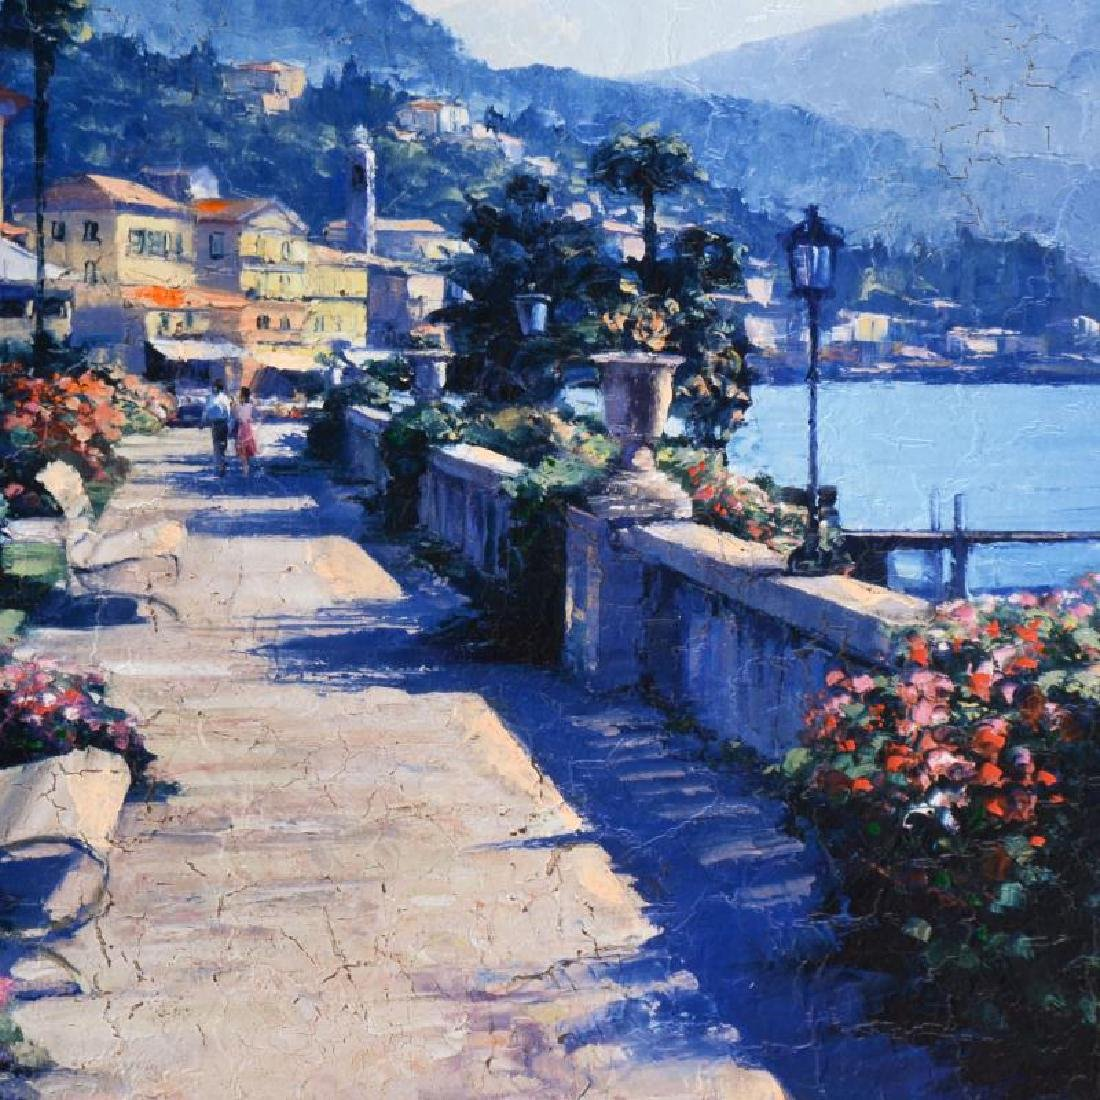 Bellagio Promenade by Behrens (1933-2014) - 2